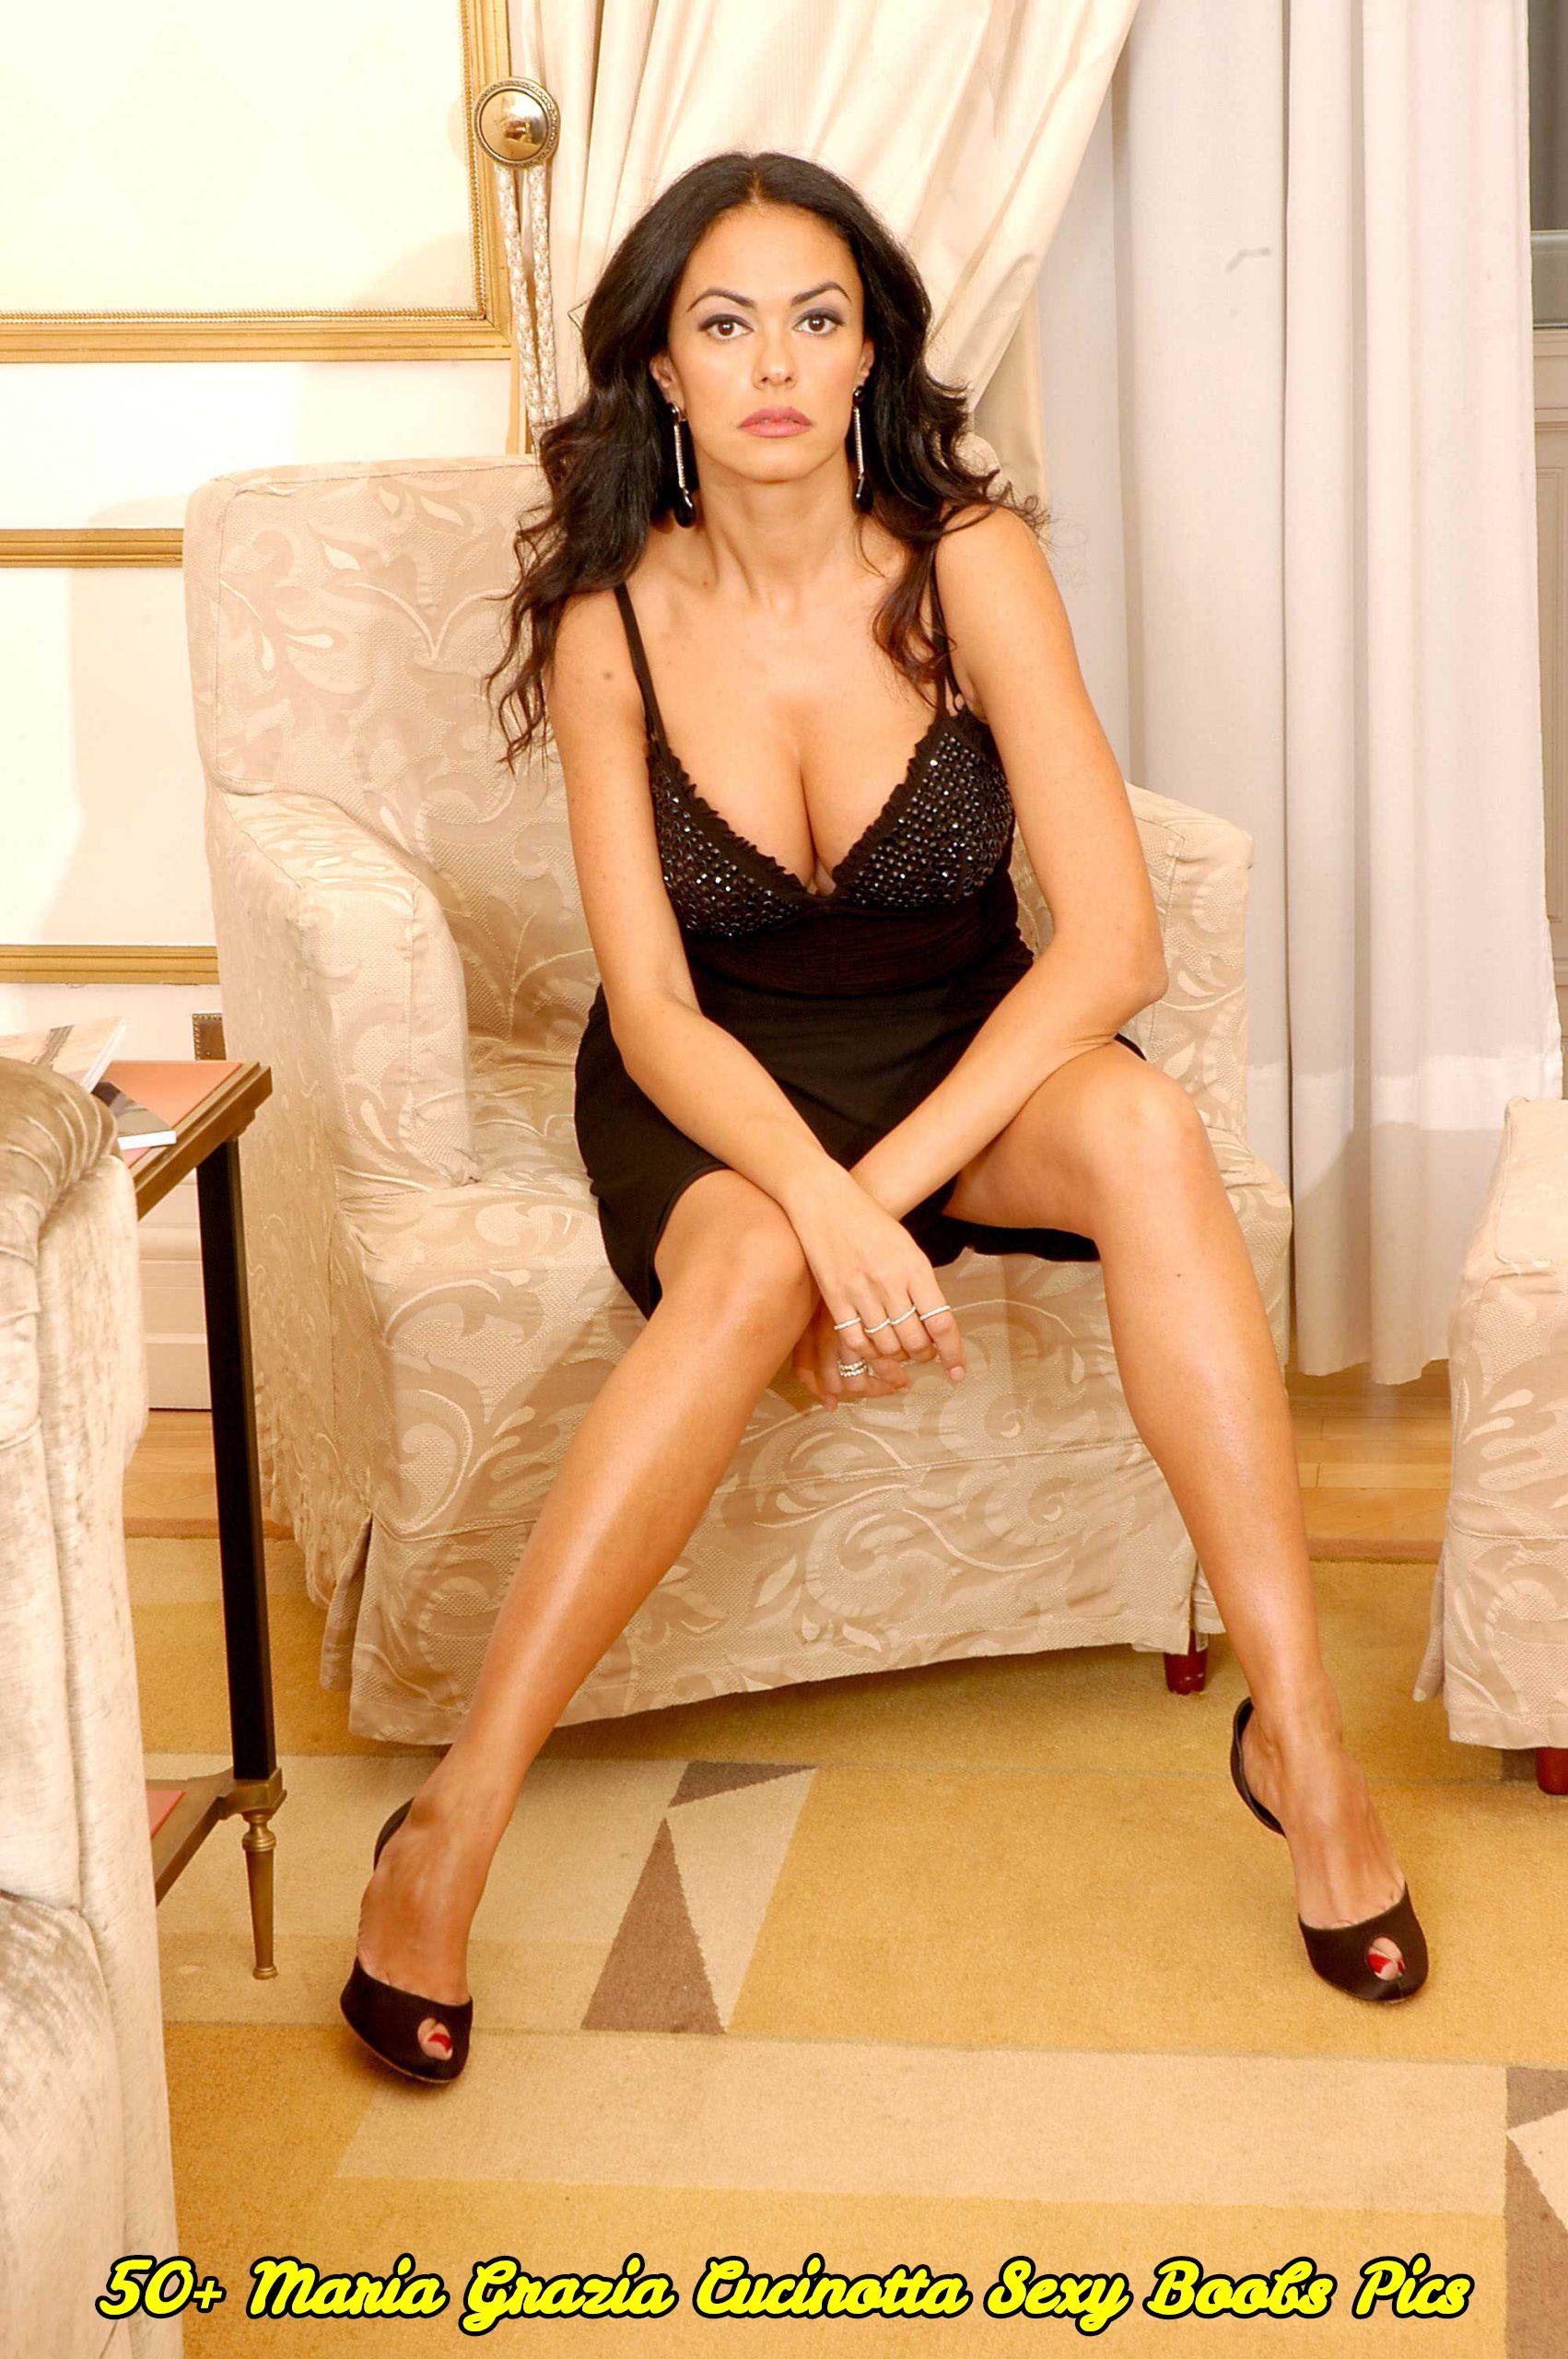 Maria Grazia Cucinotta sexy boobs pics